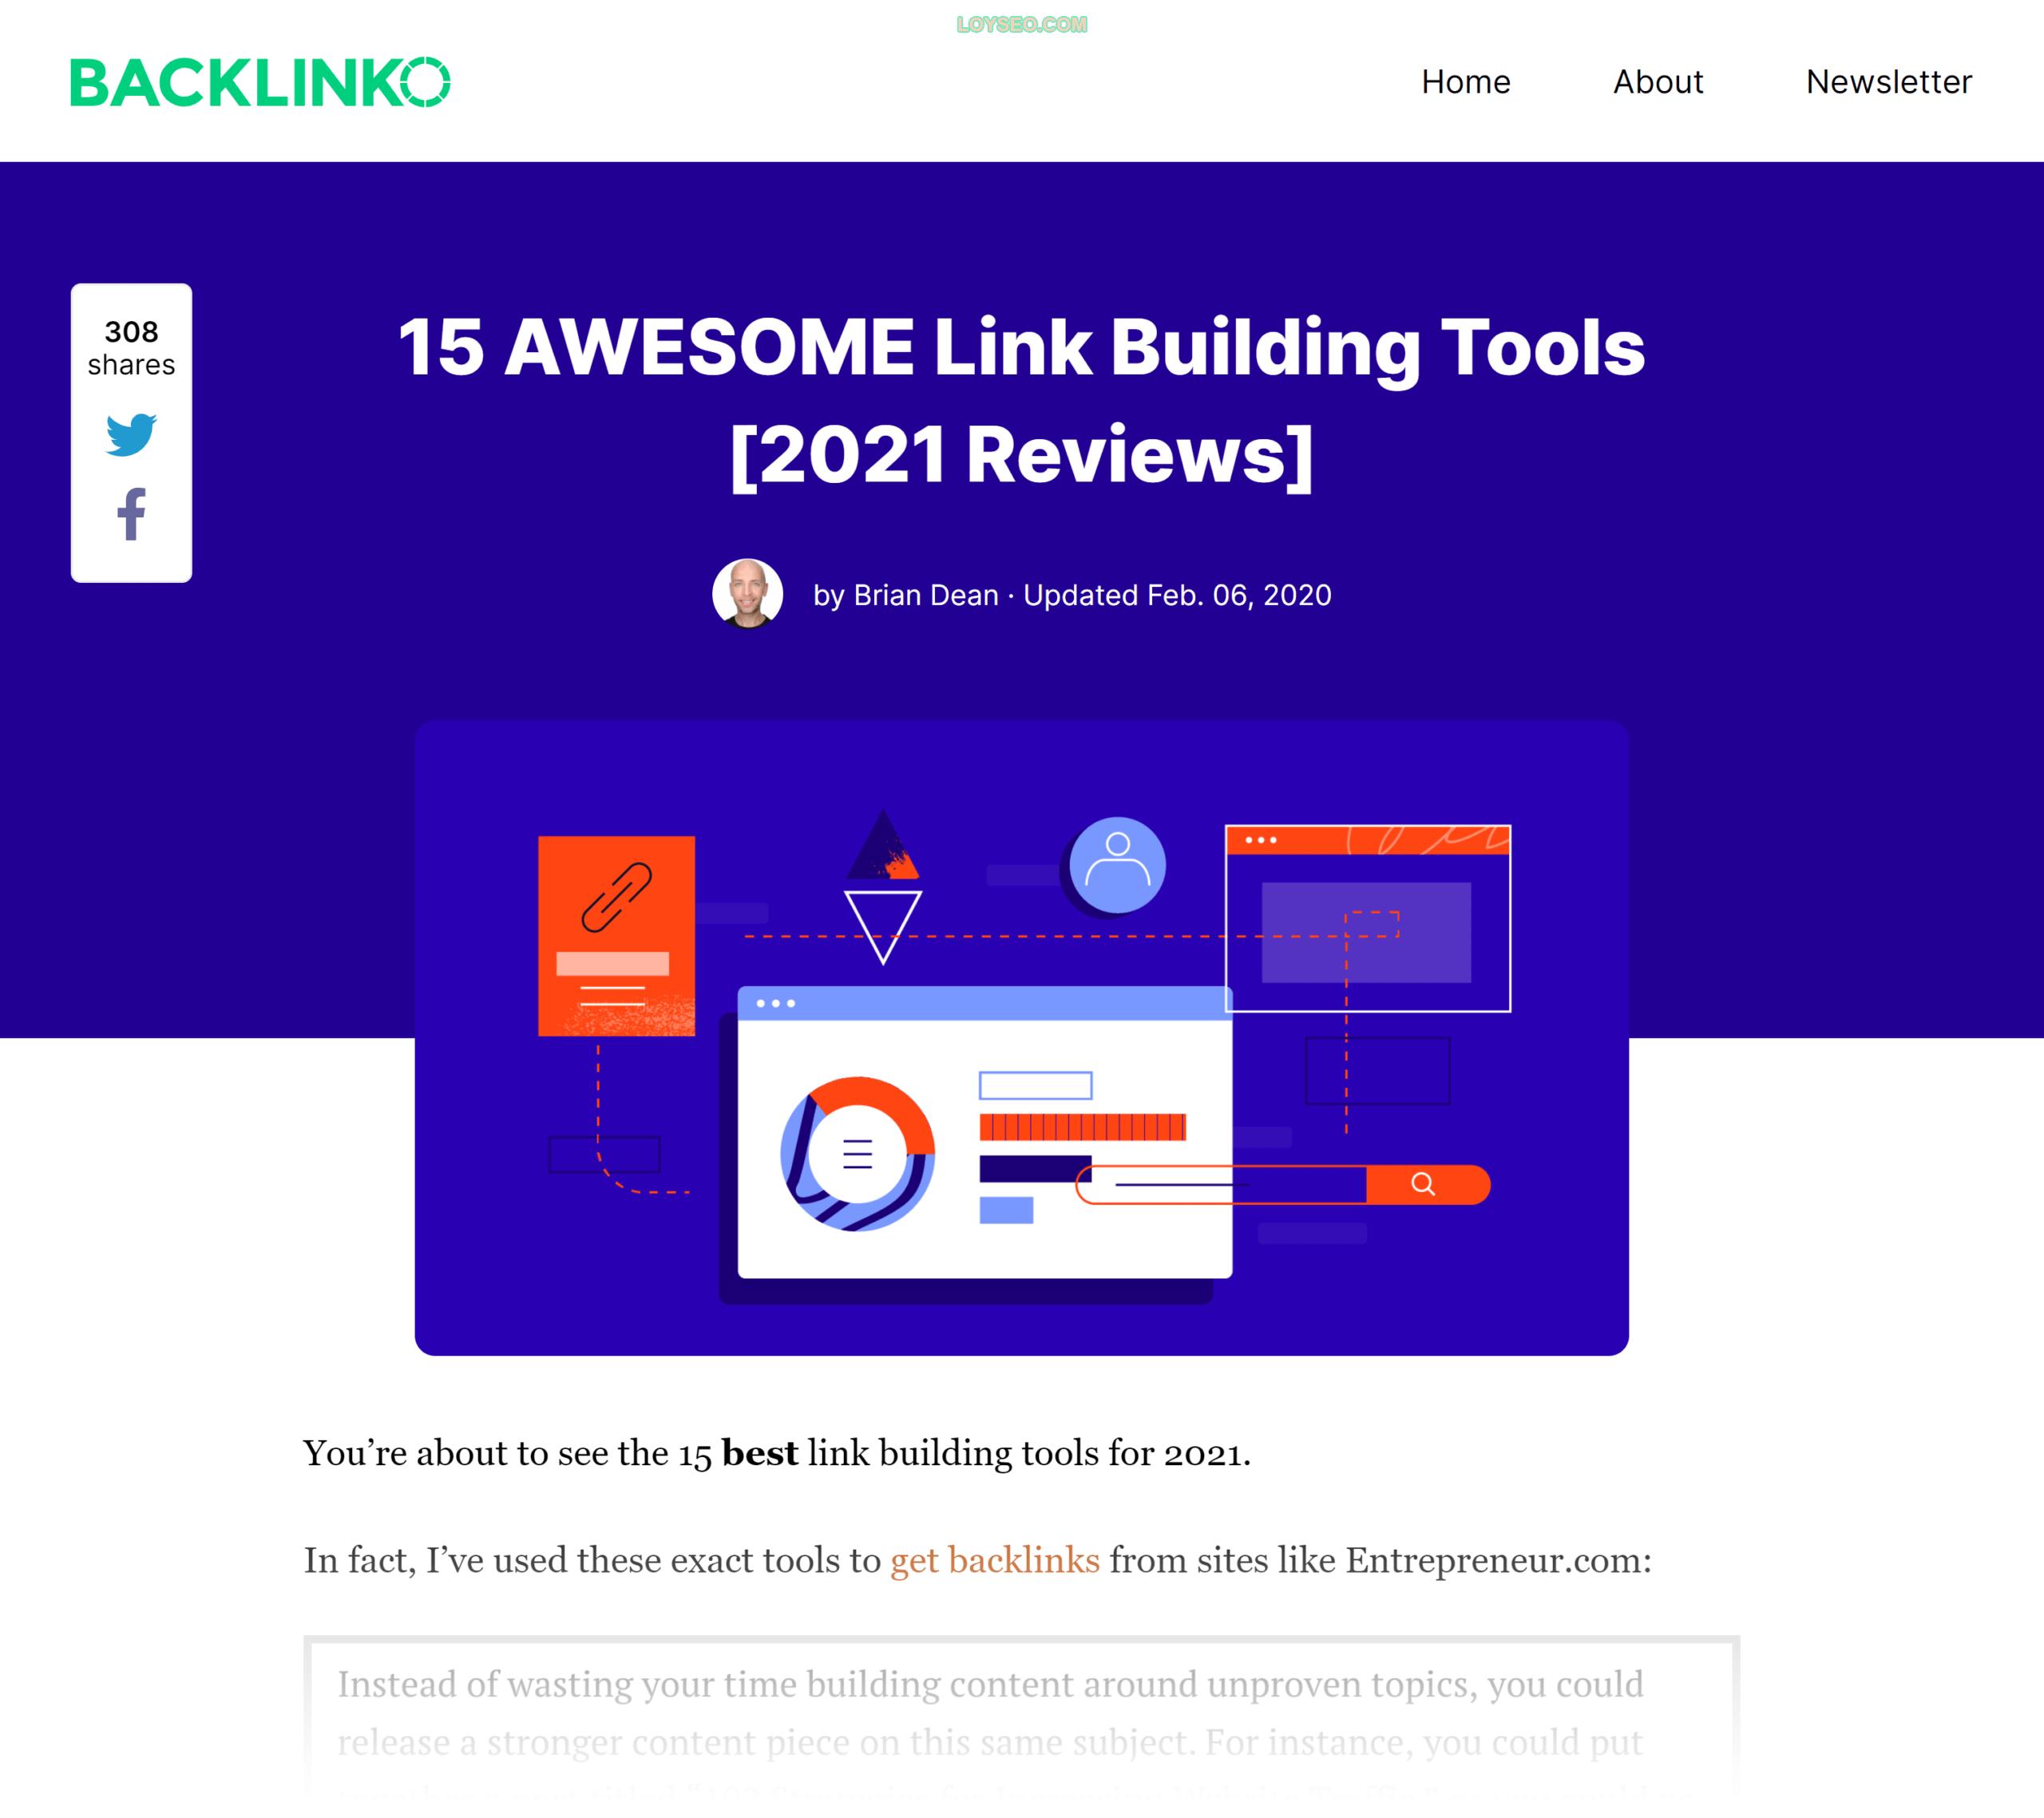 Backlinko – Link building tools